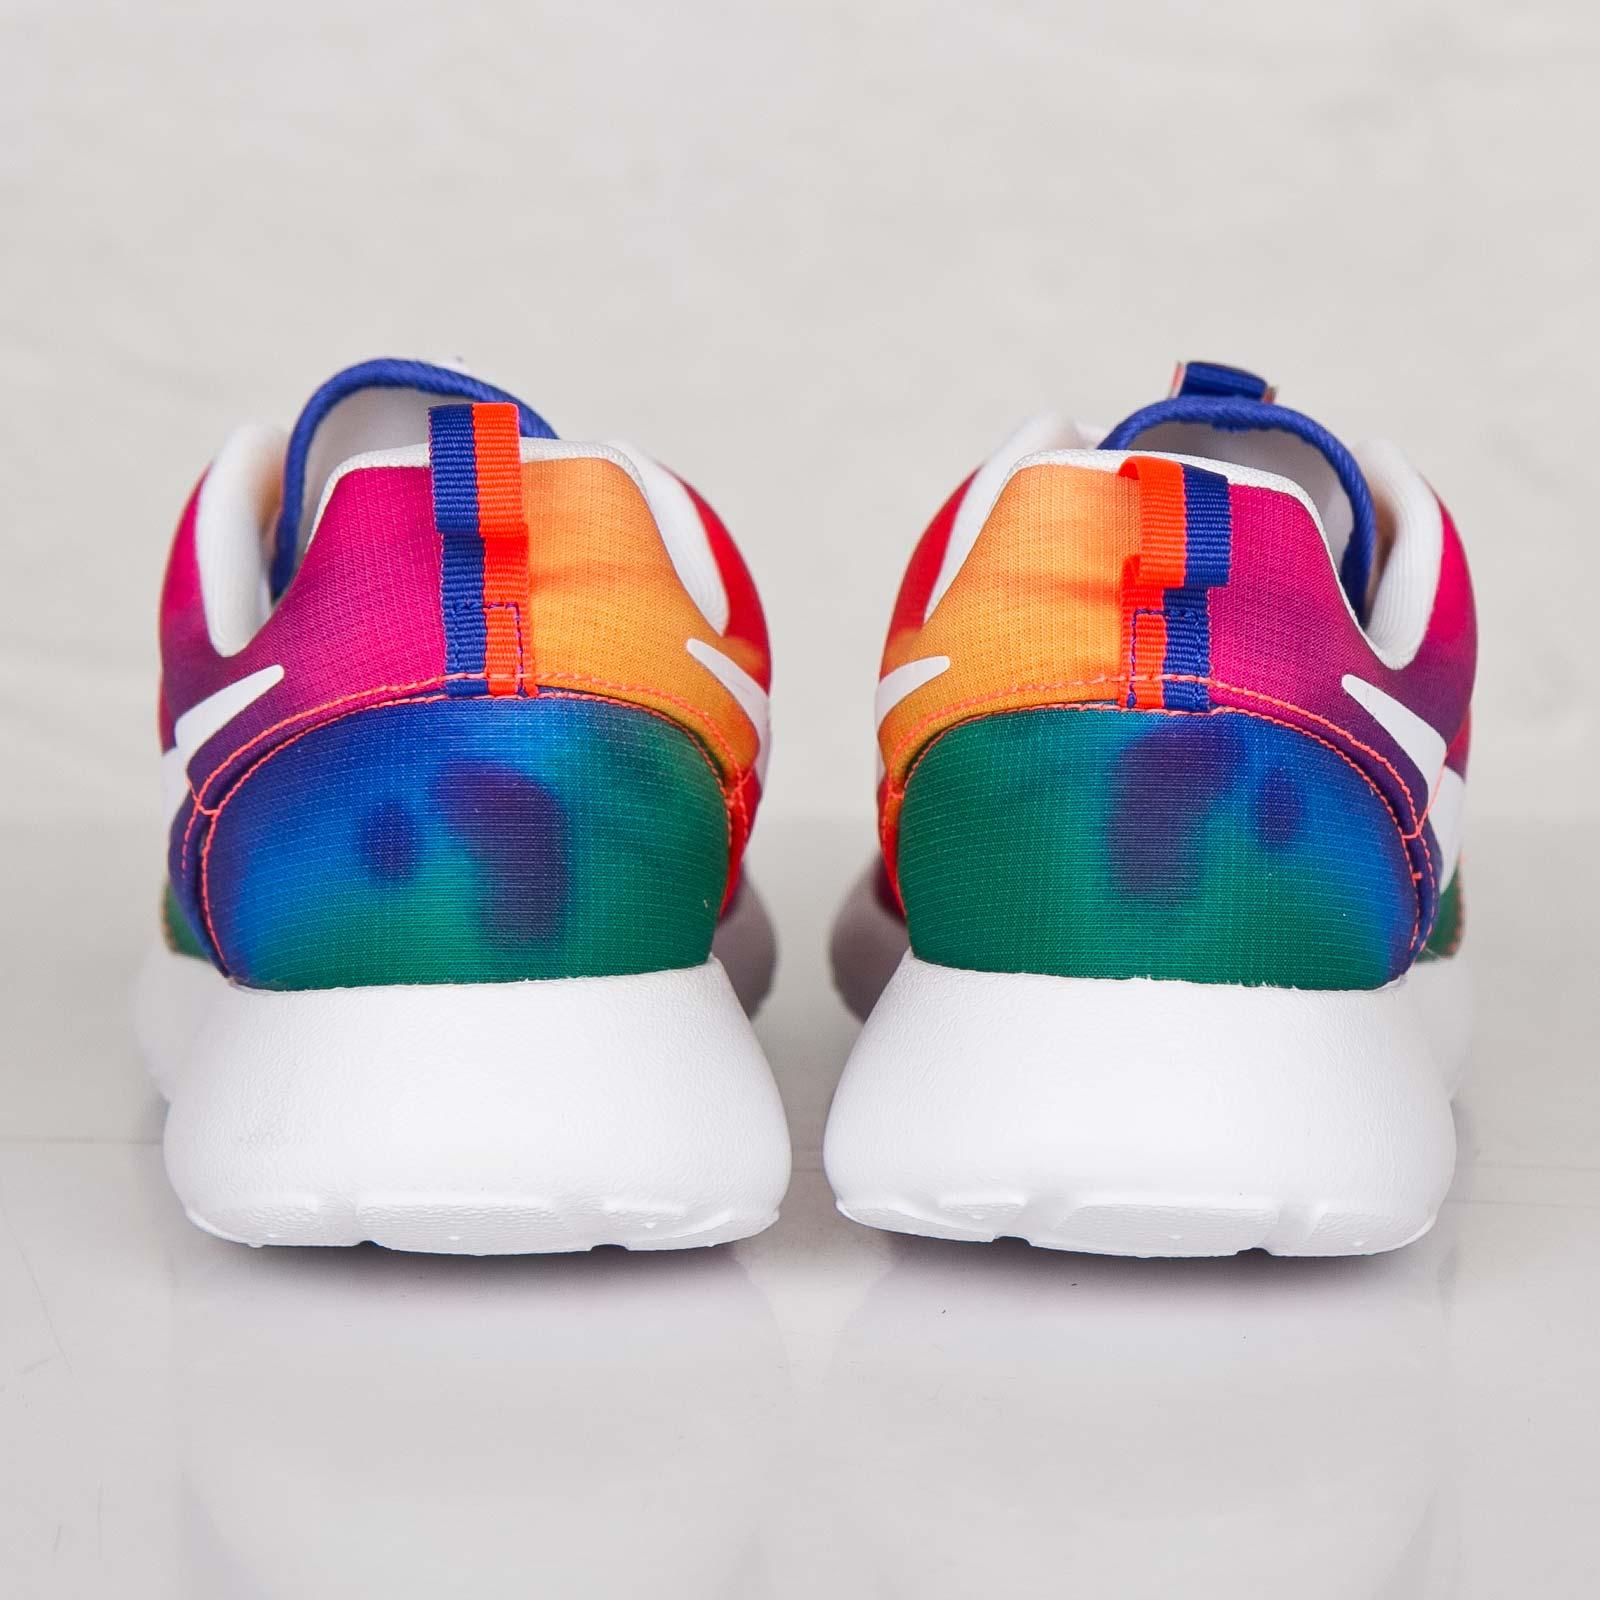 72e44adc6f62e Nike Roshe Run Print - 655206-518 - Sneakersnstuff